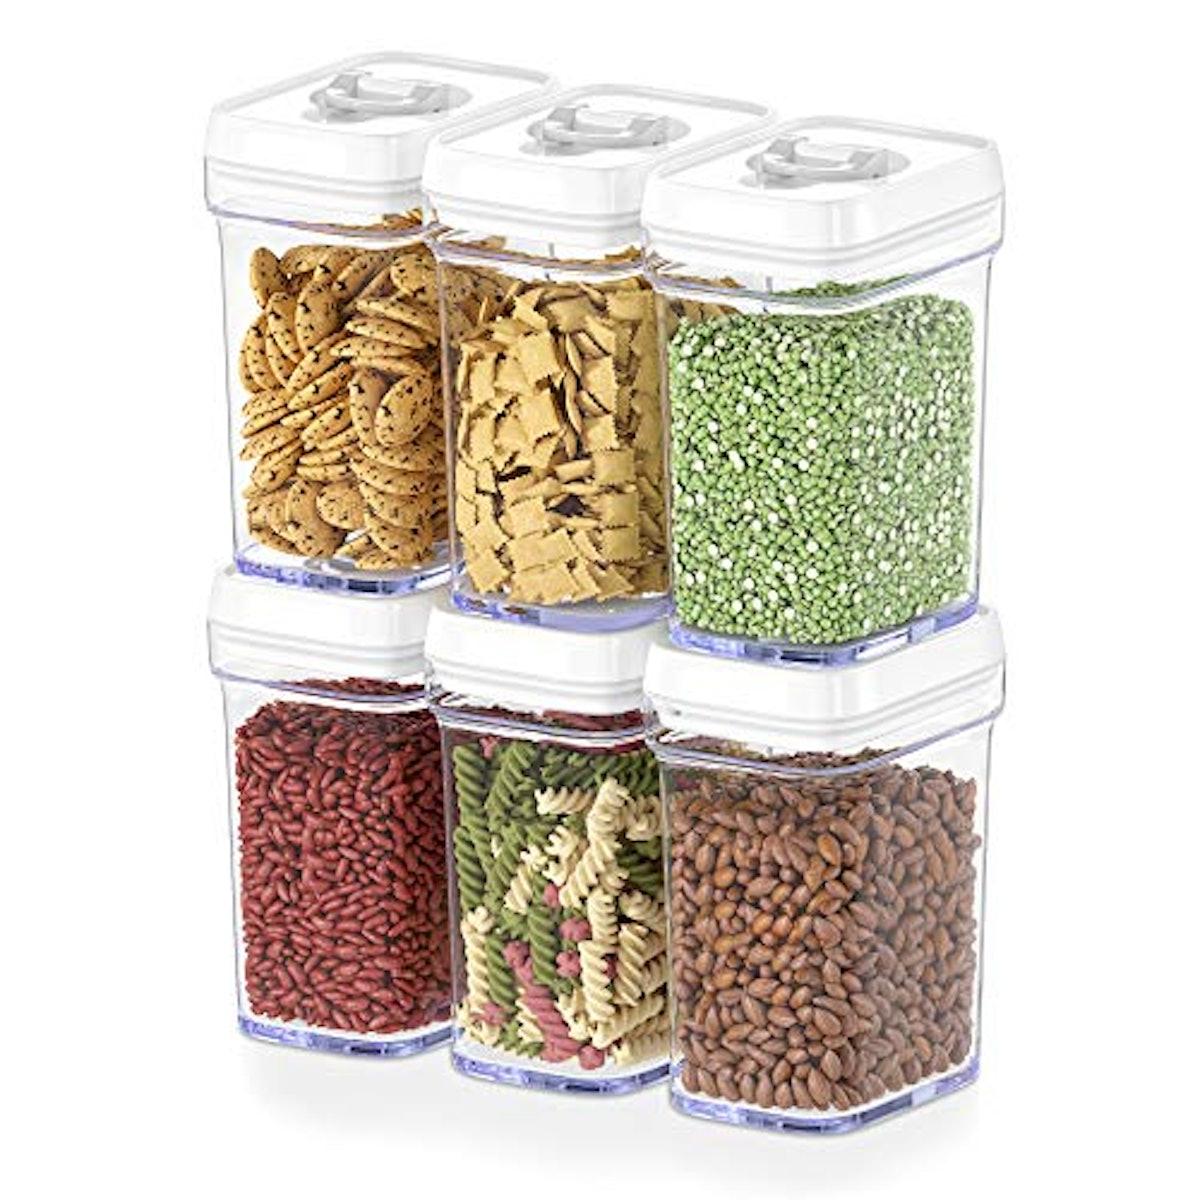 DWËLLZA KITCHEN Food Storage Containers (6-Piece Set)